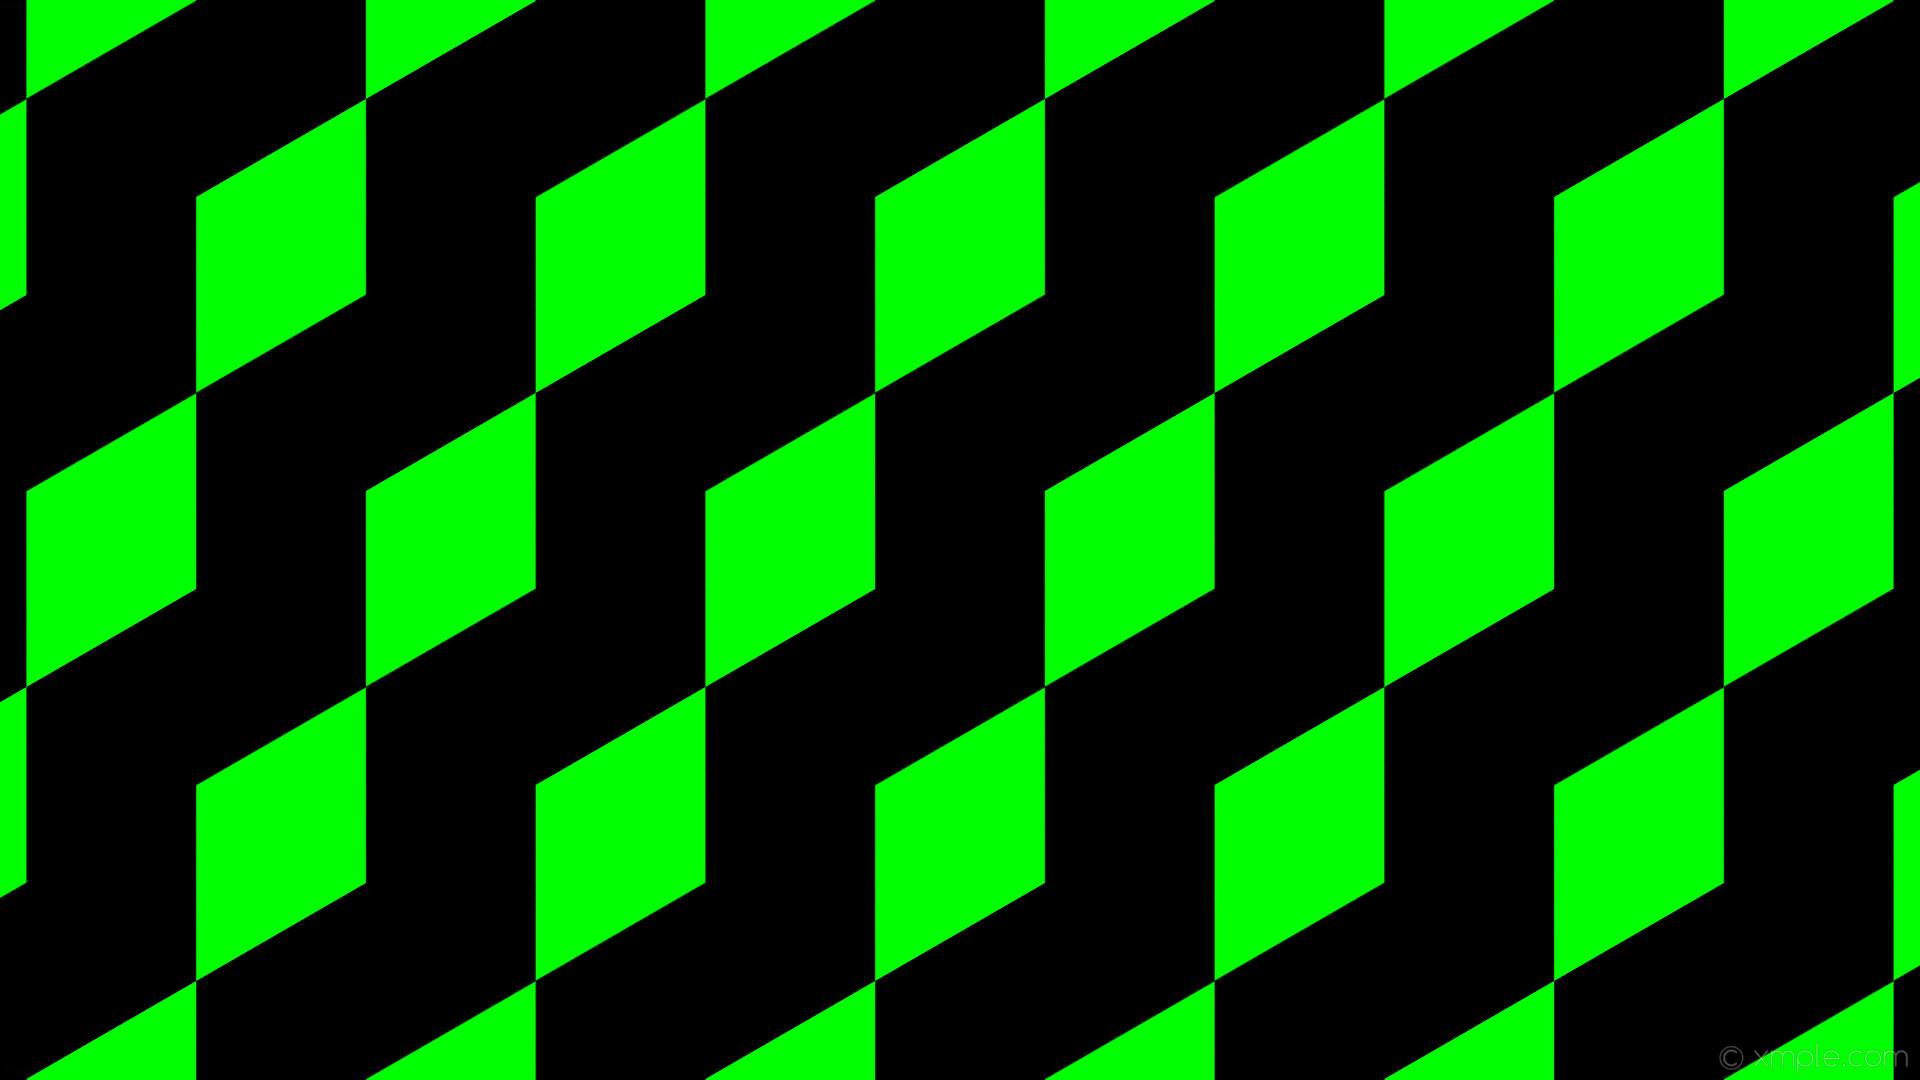 wallpaper 3d cubes green black lime #000000 #00ff00 #000000 300° 196px